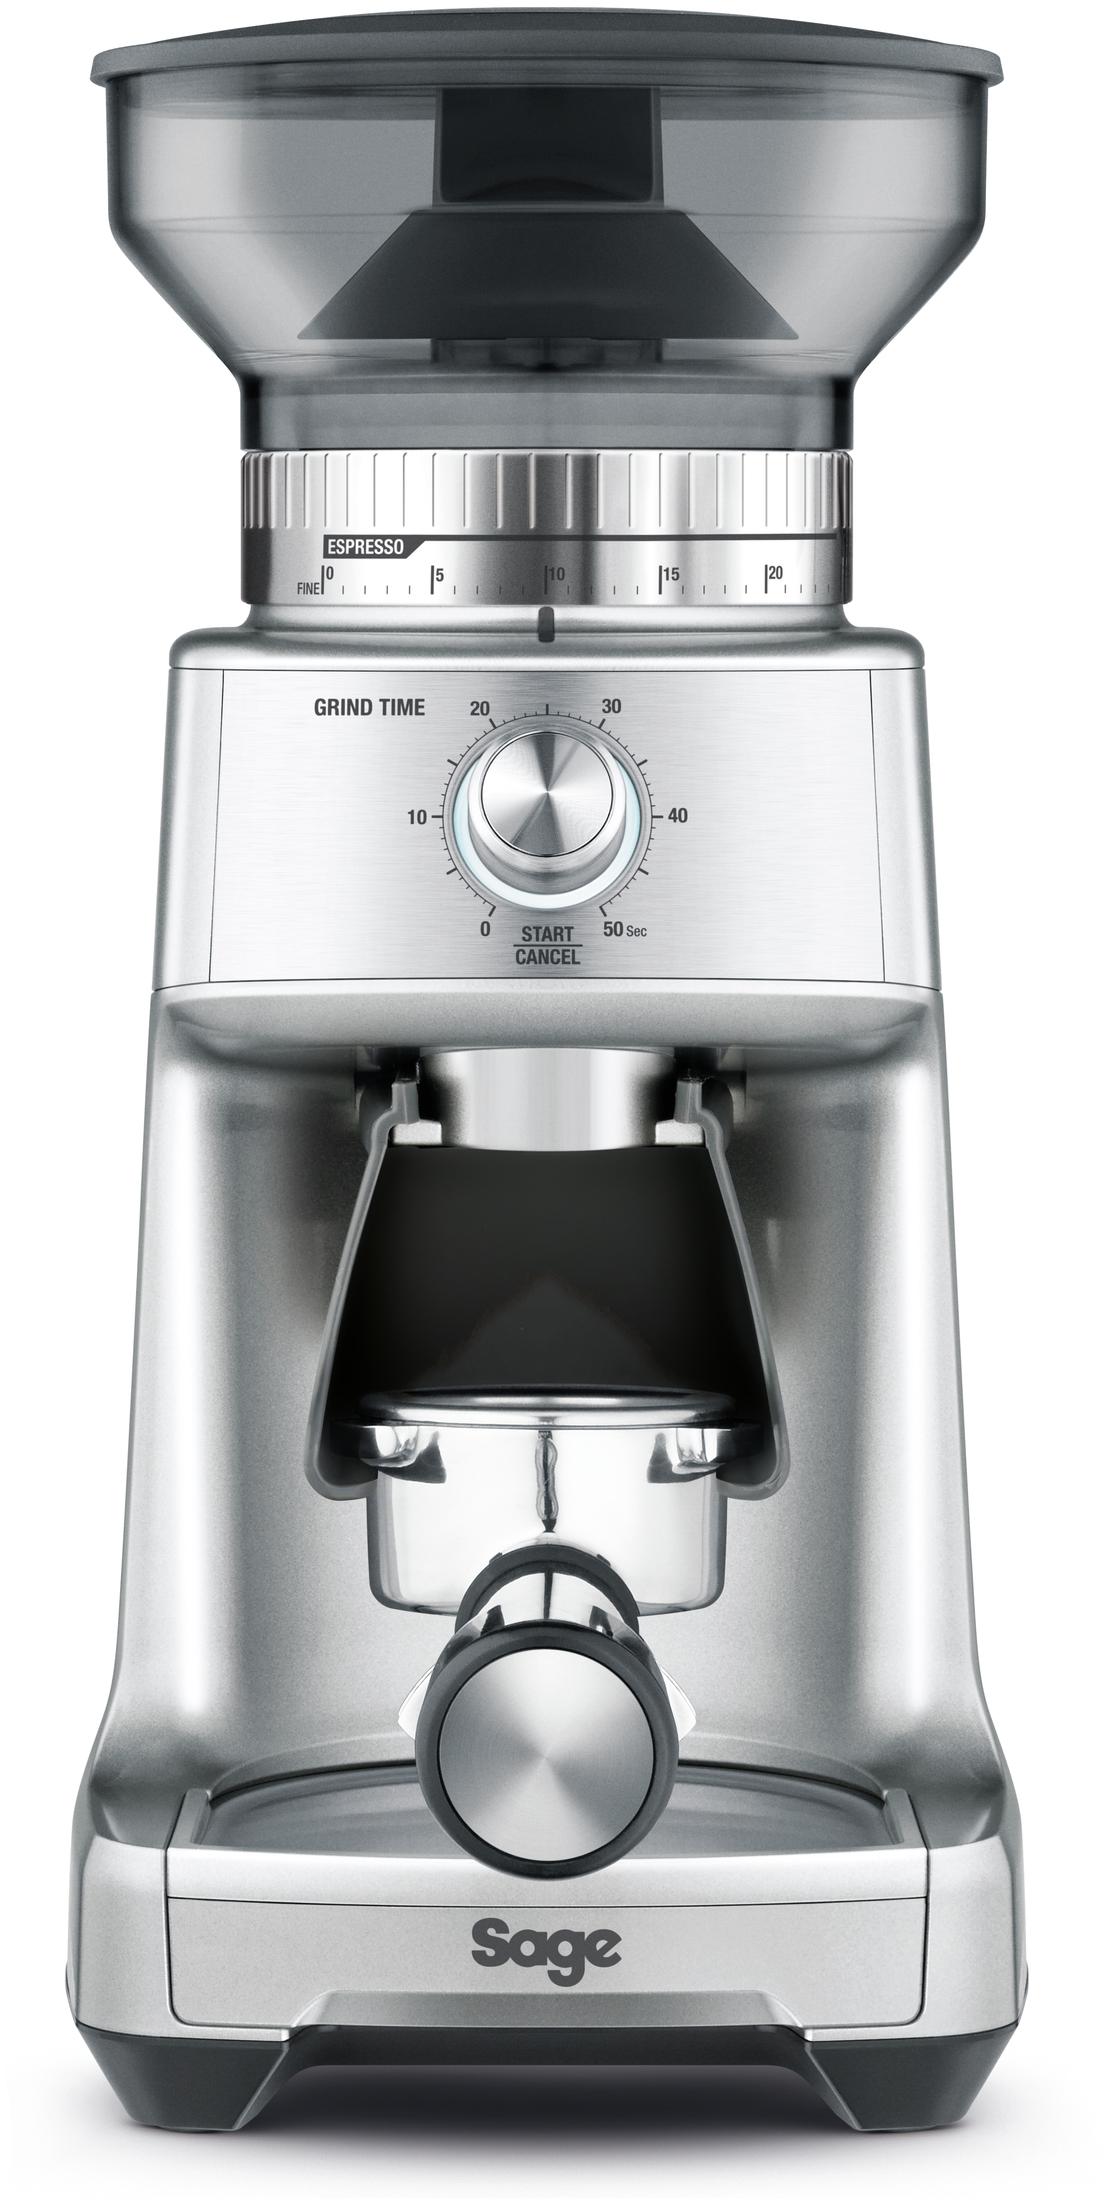 Sage The Dose Control Pro kaffekværn